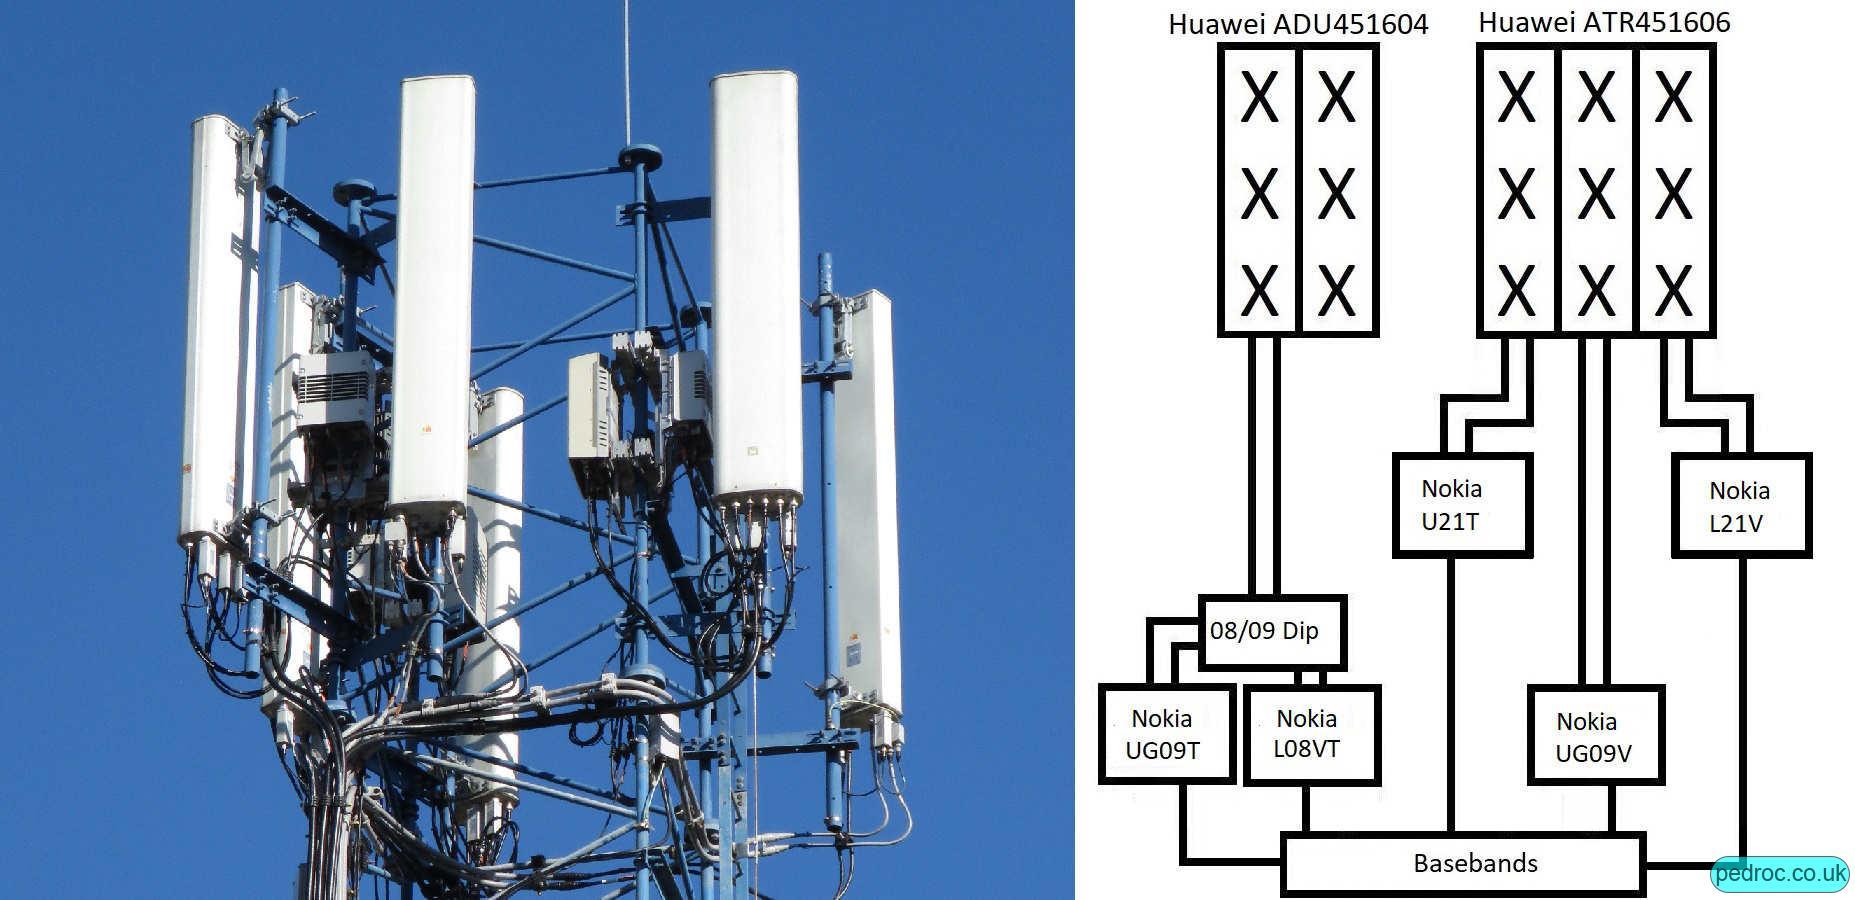 Vodafone Nokia Medium capacity site, Huawei ADU and ATR antennas with separate 900MHz and 2100MHz.